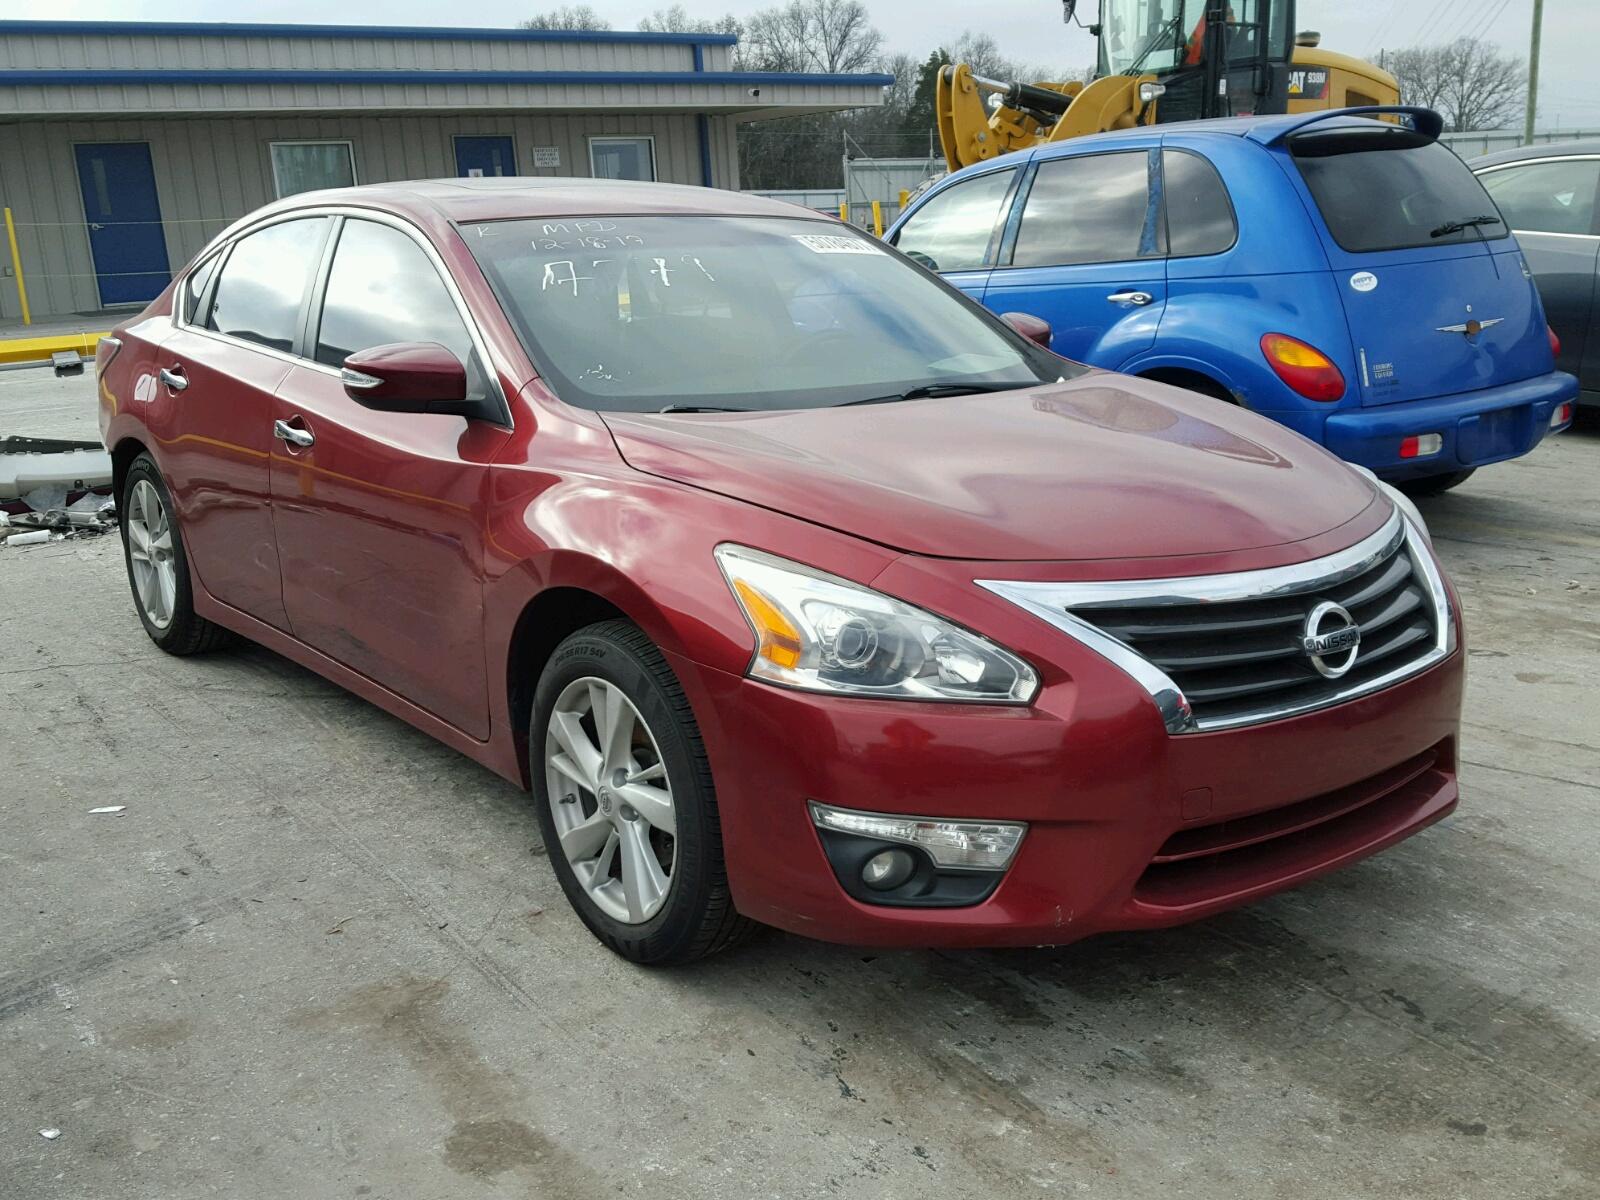 Auto Auction Ended On Vin 1n4al2ap0cn432314 2012 Nissan